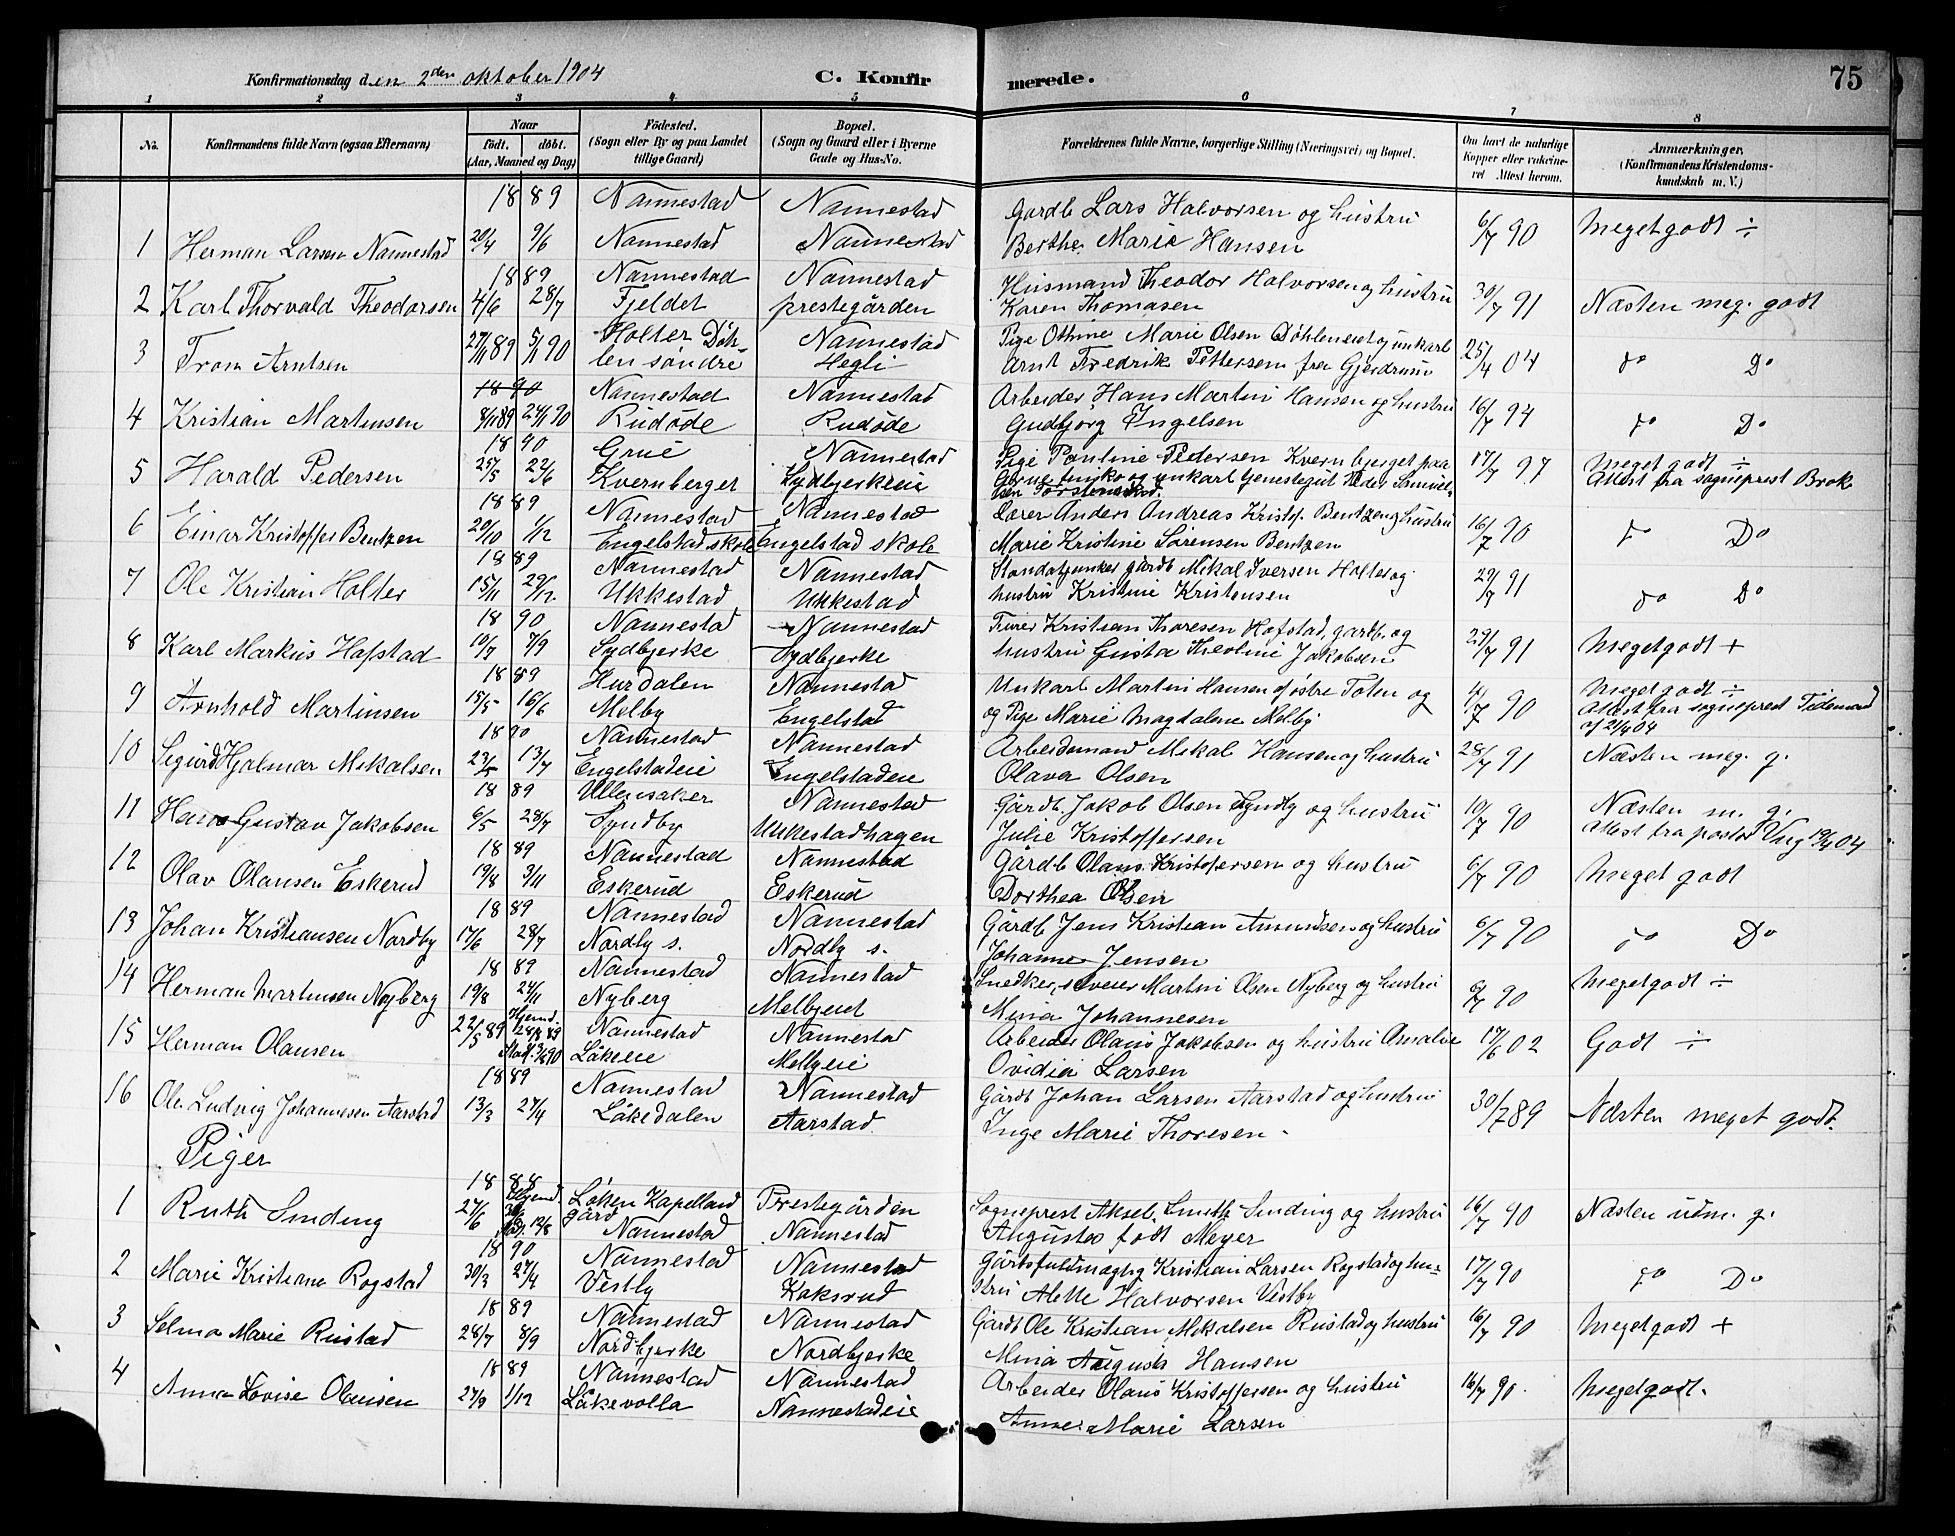 SAO, Nannestad prestekontor Kirkebøker, G/Ga/L0002: Klokkerbok nr. I 2, 1901-1913, s. 75